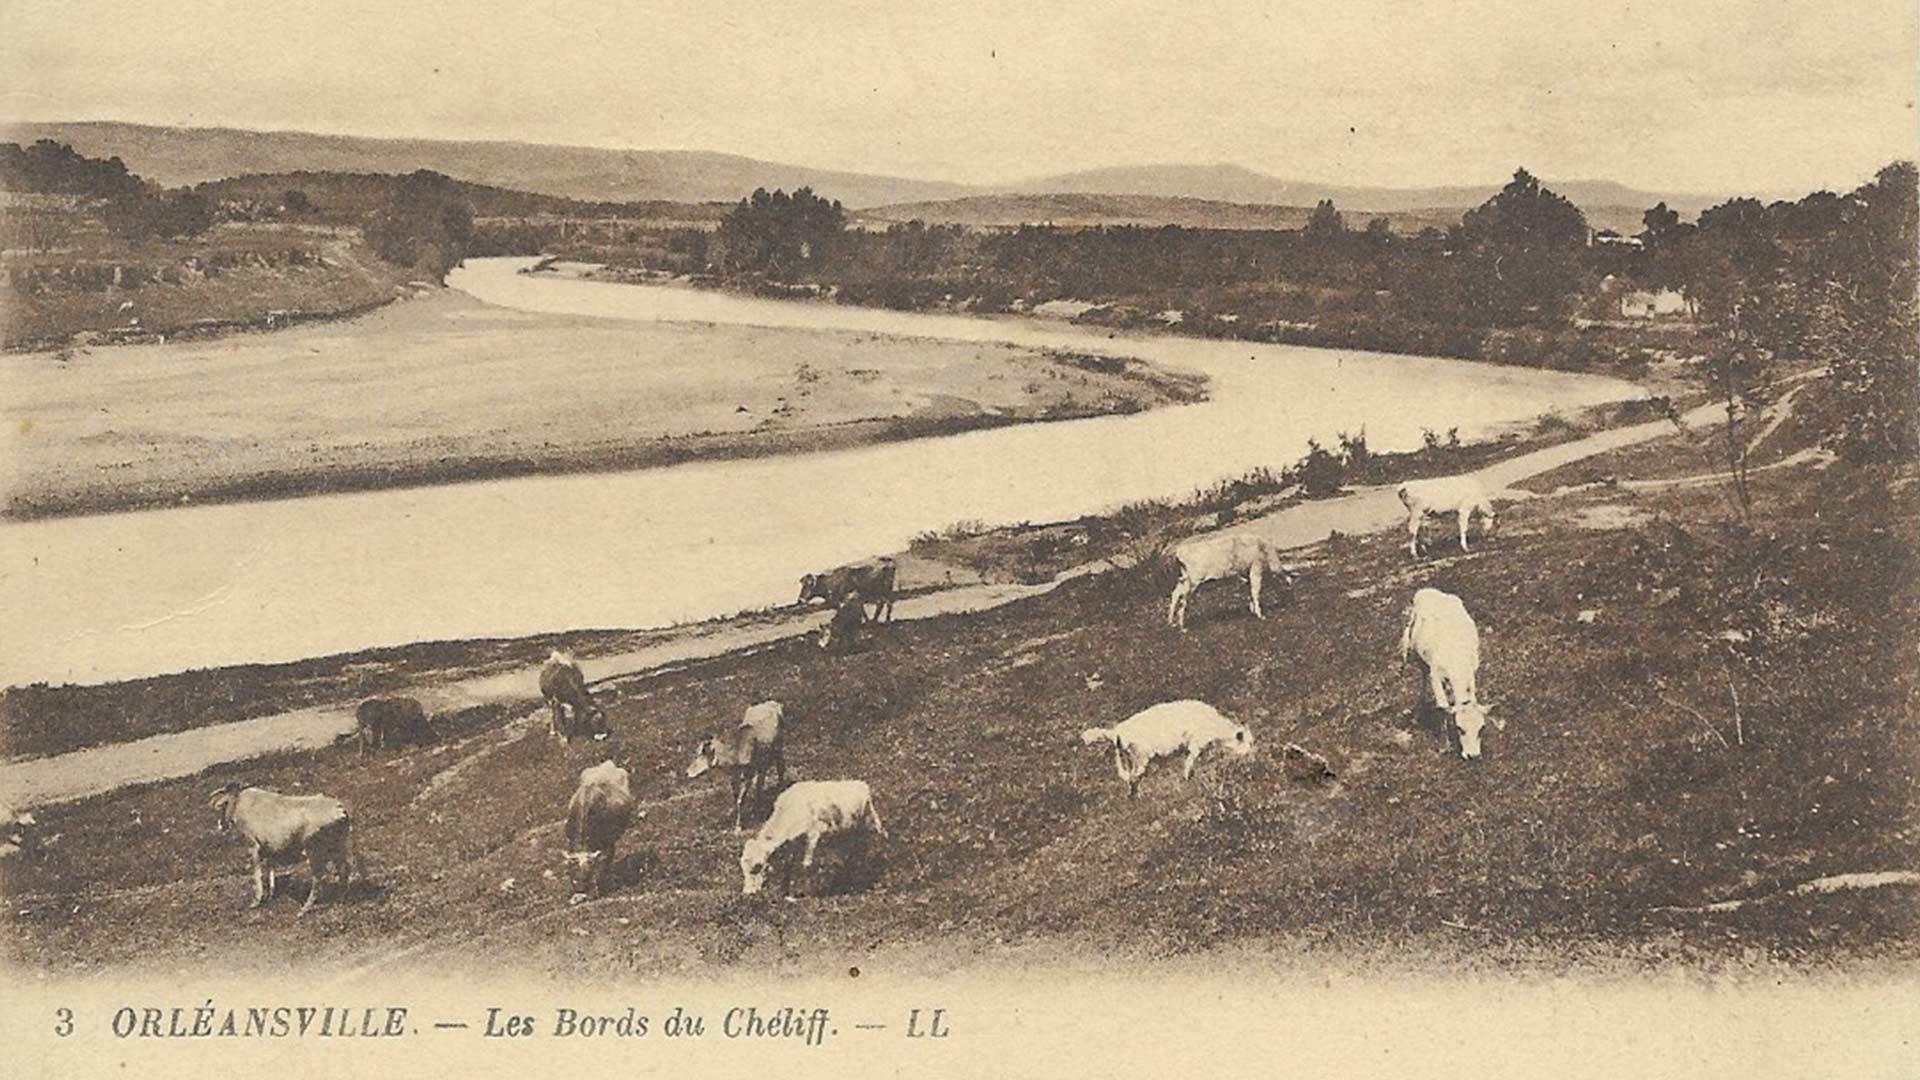 Orleansville-Cheliff